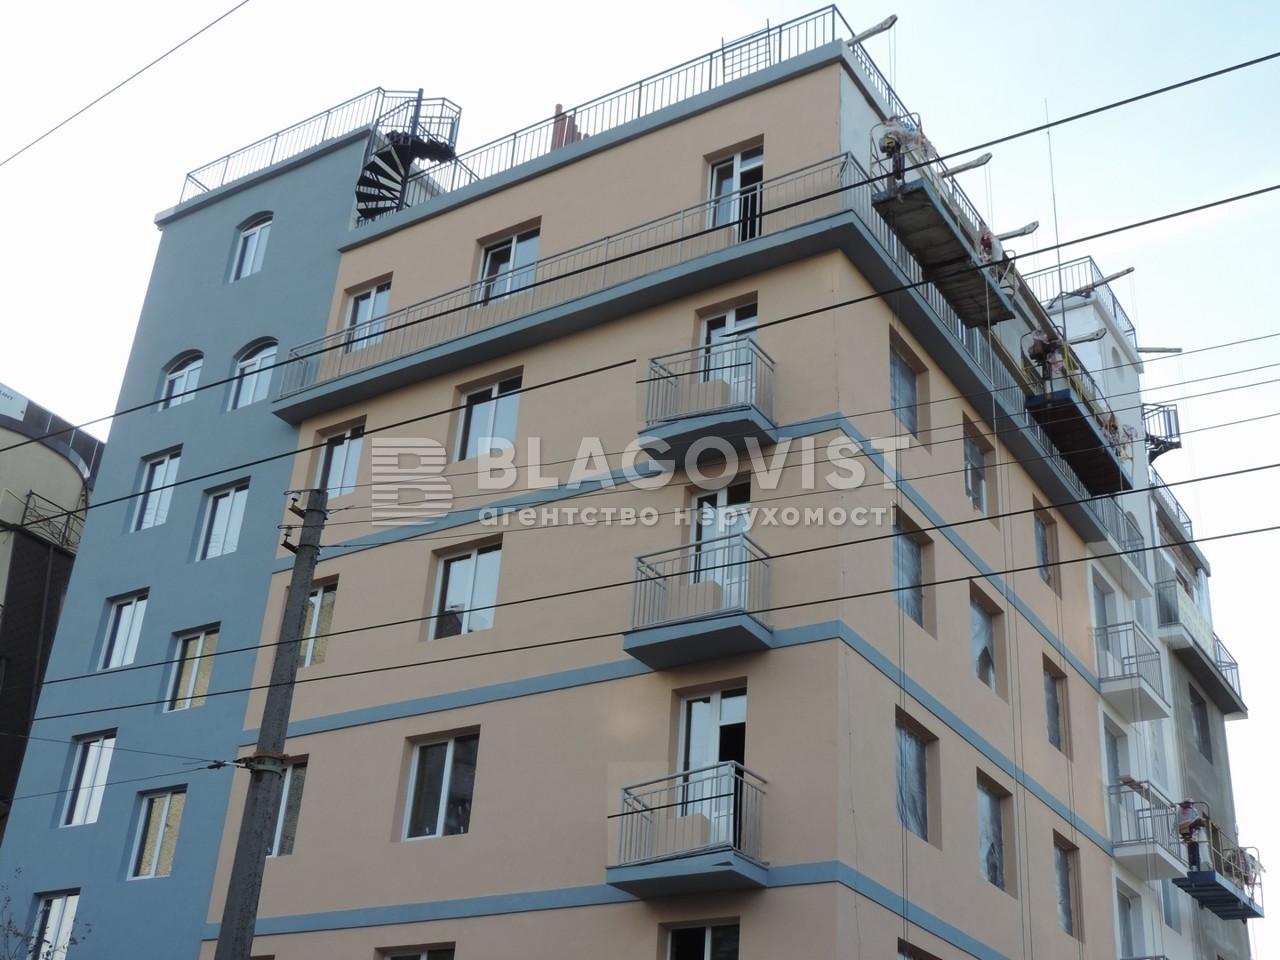 Будинок, D-27141, Вавилових, Київ - Фото 4